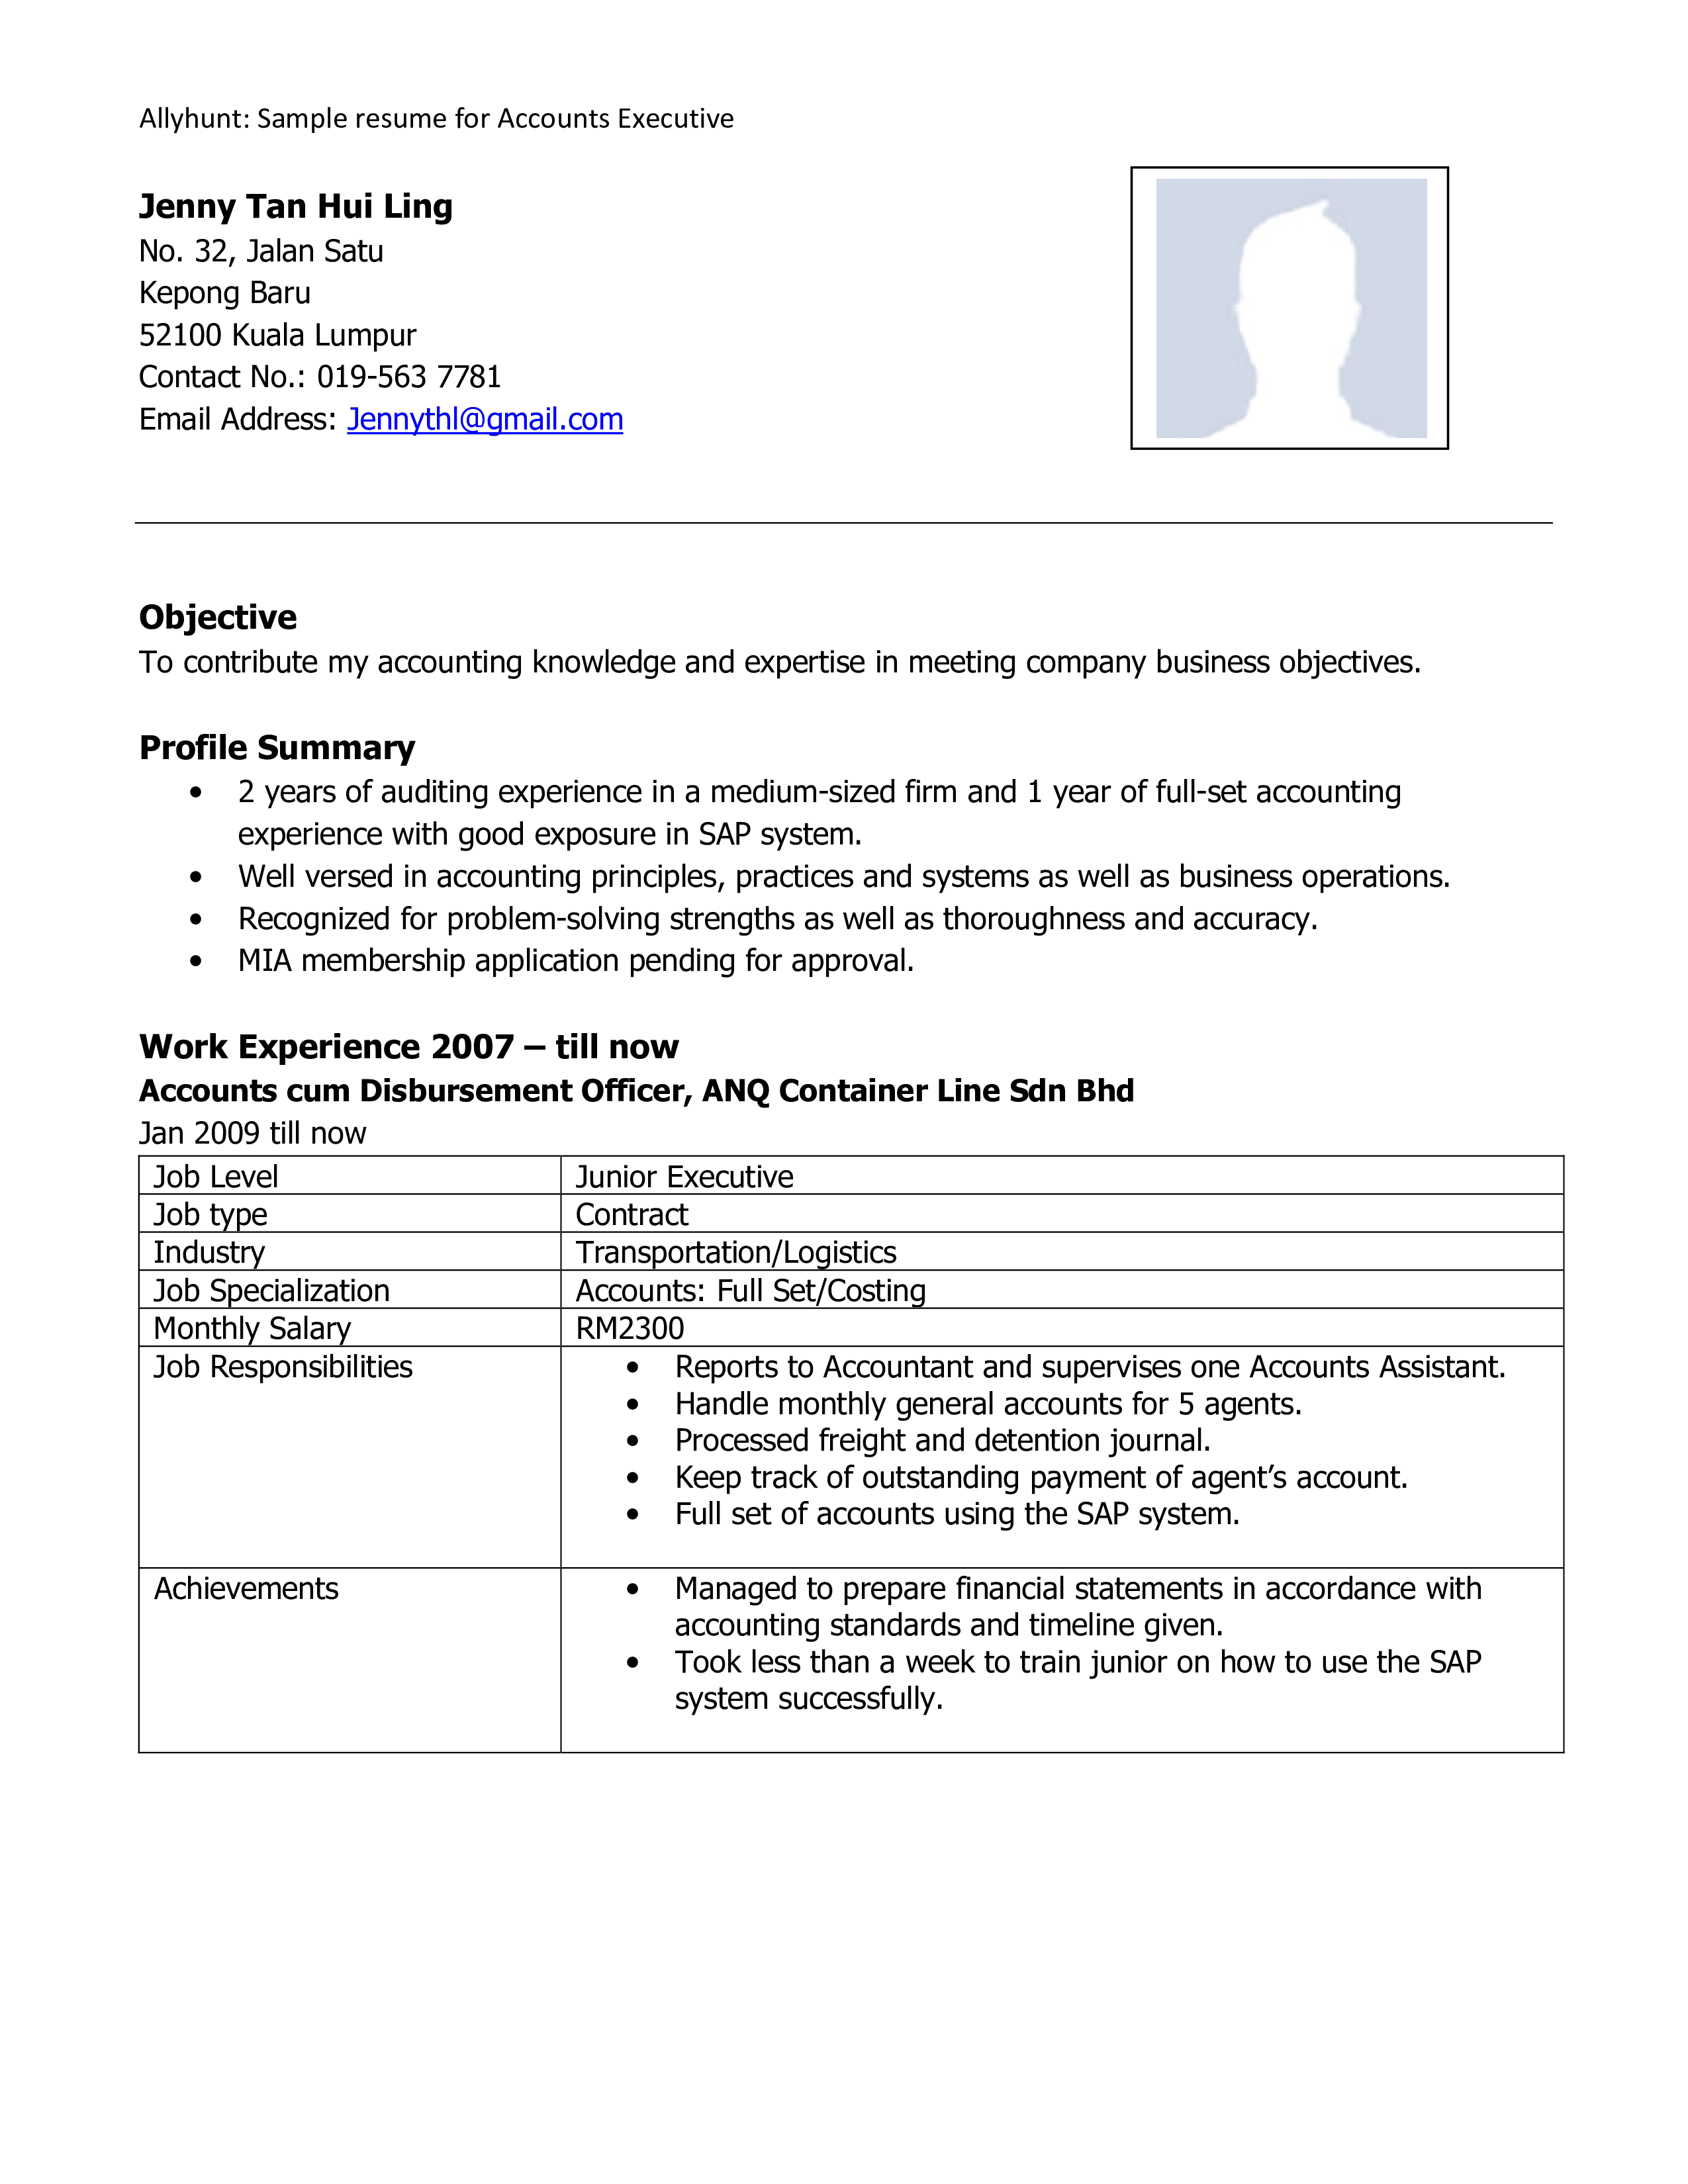 Account Executive Profile Resume How To Draft An Account Executive Profile Resume Download This Account Executive Account Executive Resume Templates Resume